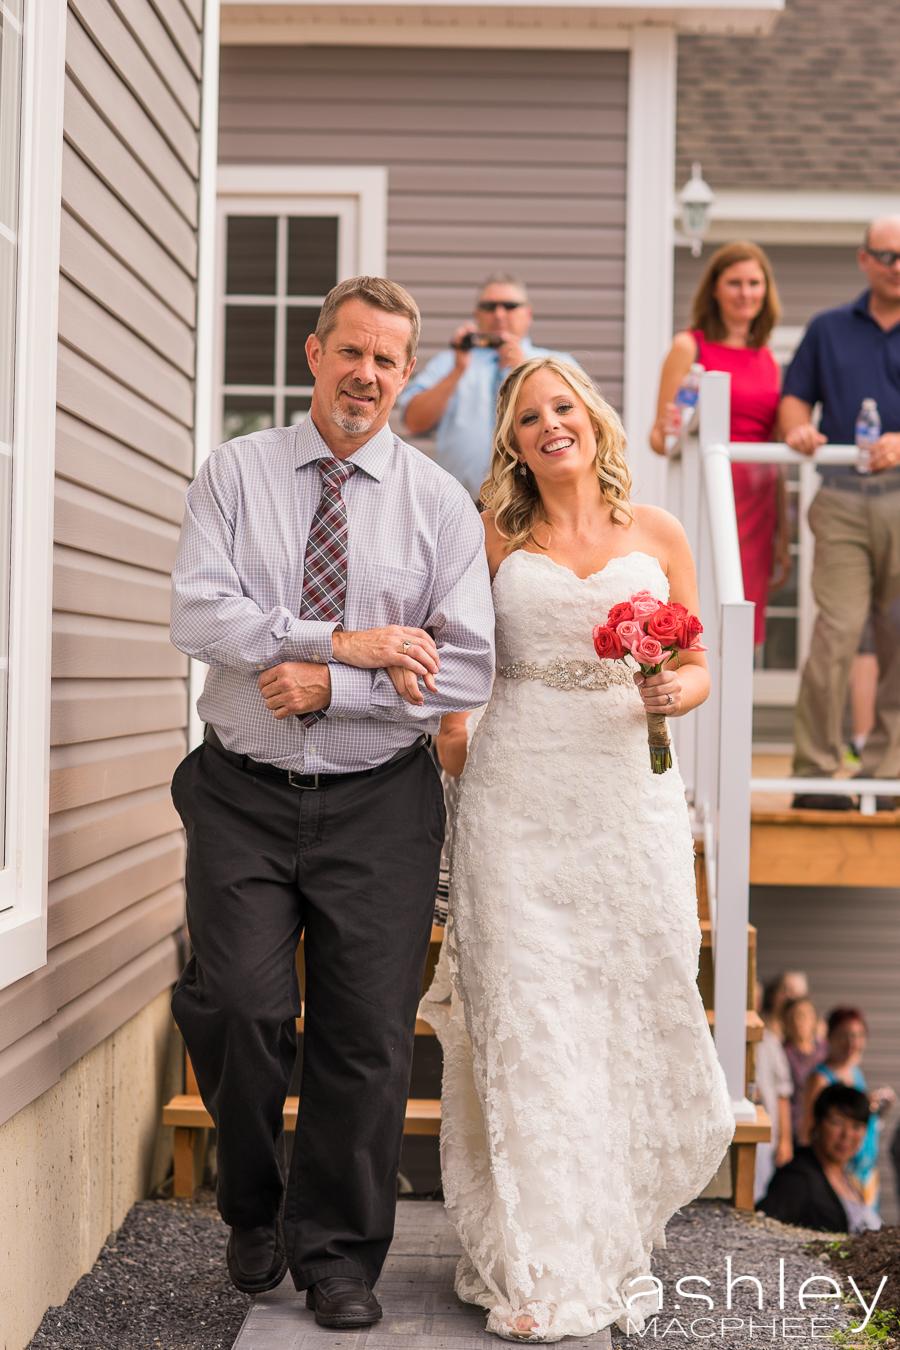 Ashley MacPhee Photography New Brunswick Wedding Photographer (43 of 65).jpg